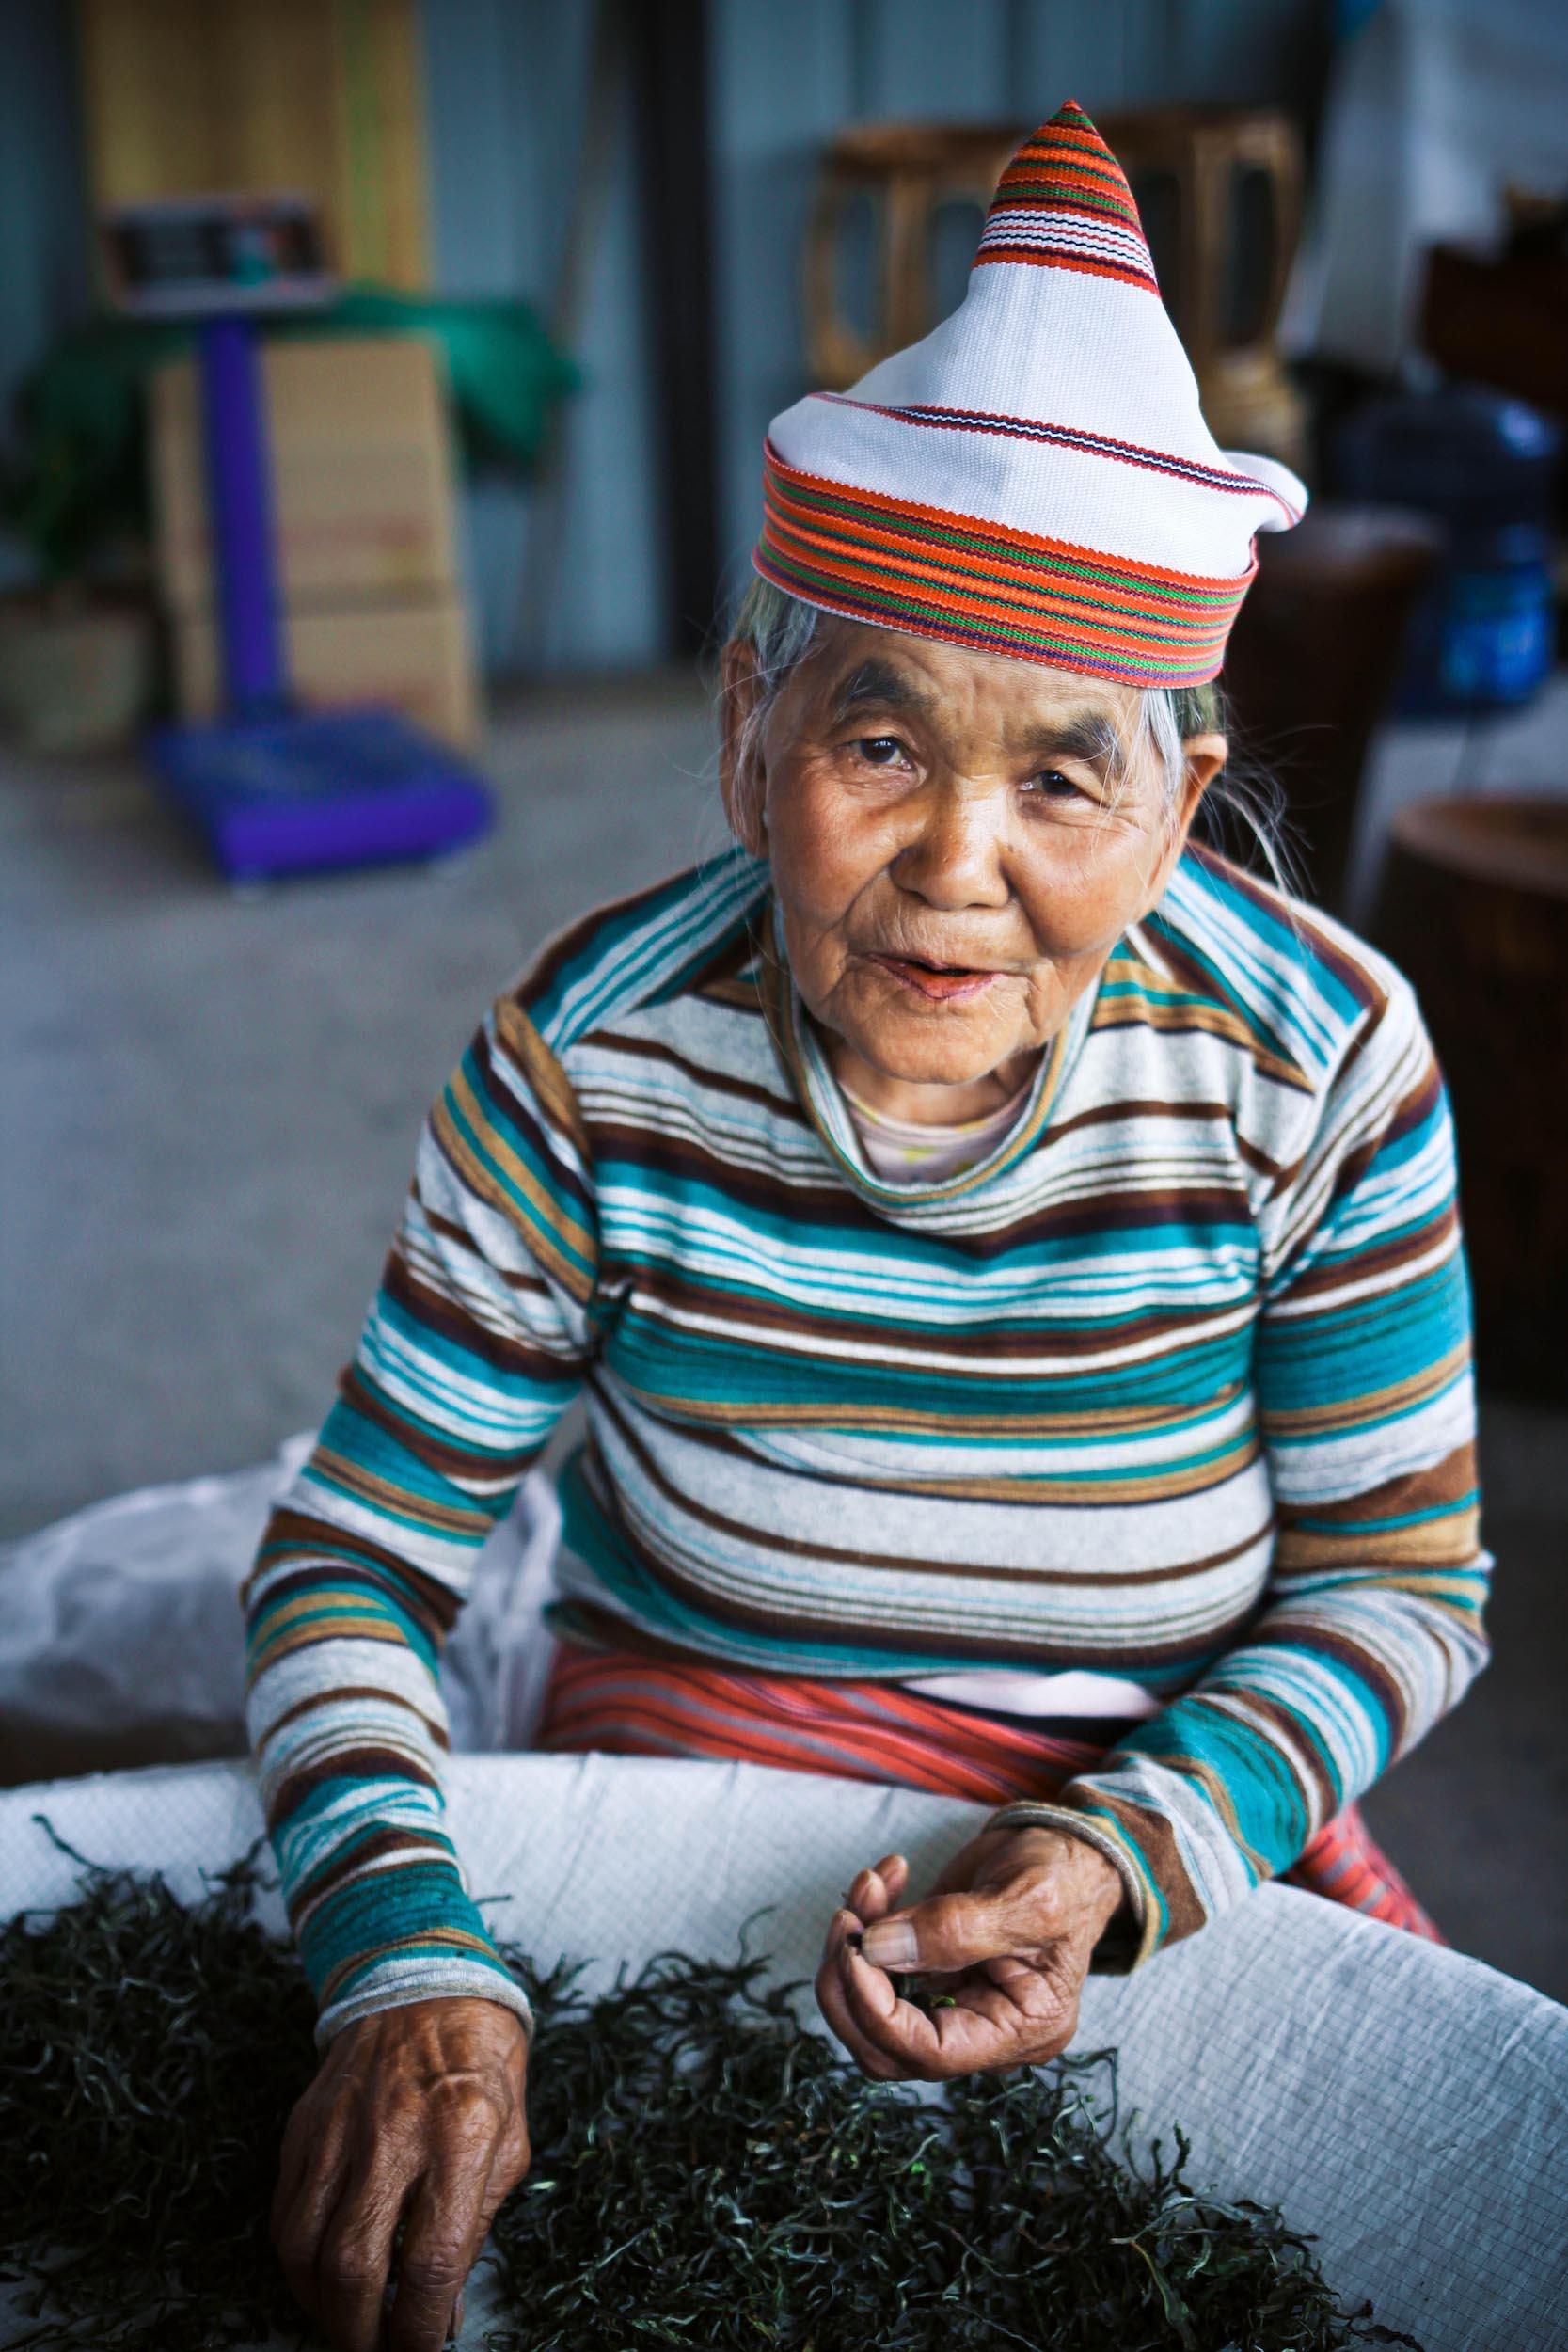 Grandma from Tea Farmers of Yunnan - 2016, © Jin Zhao